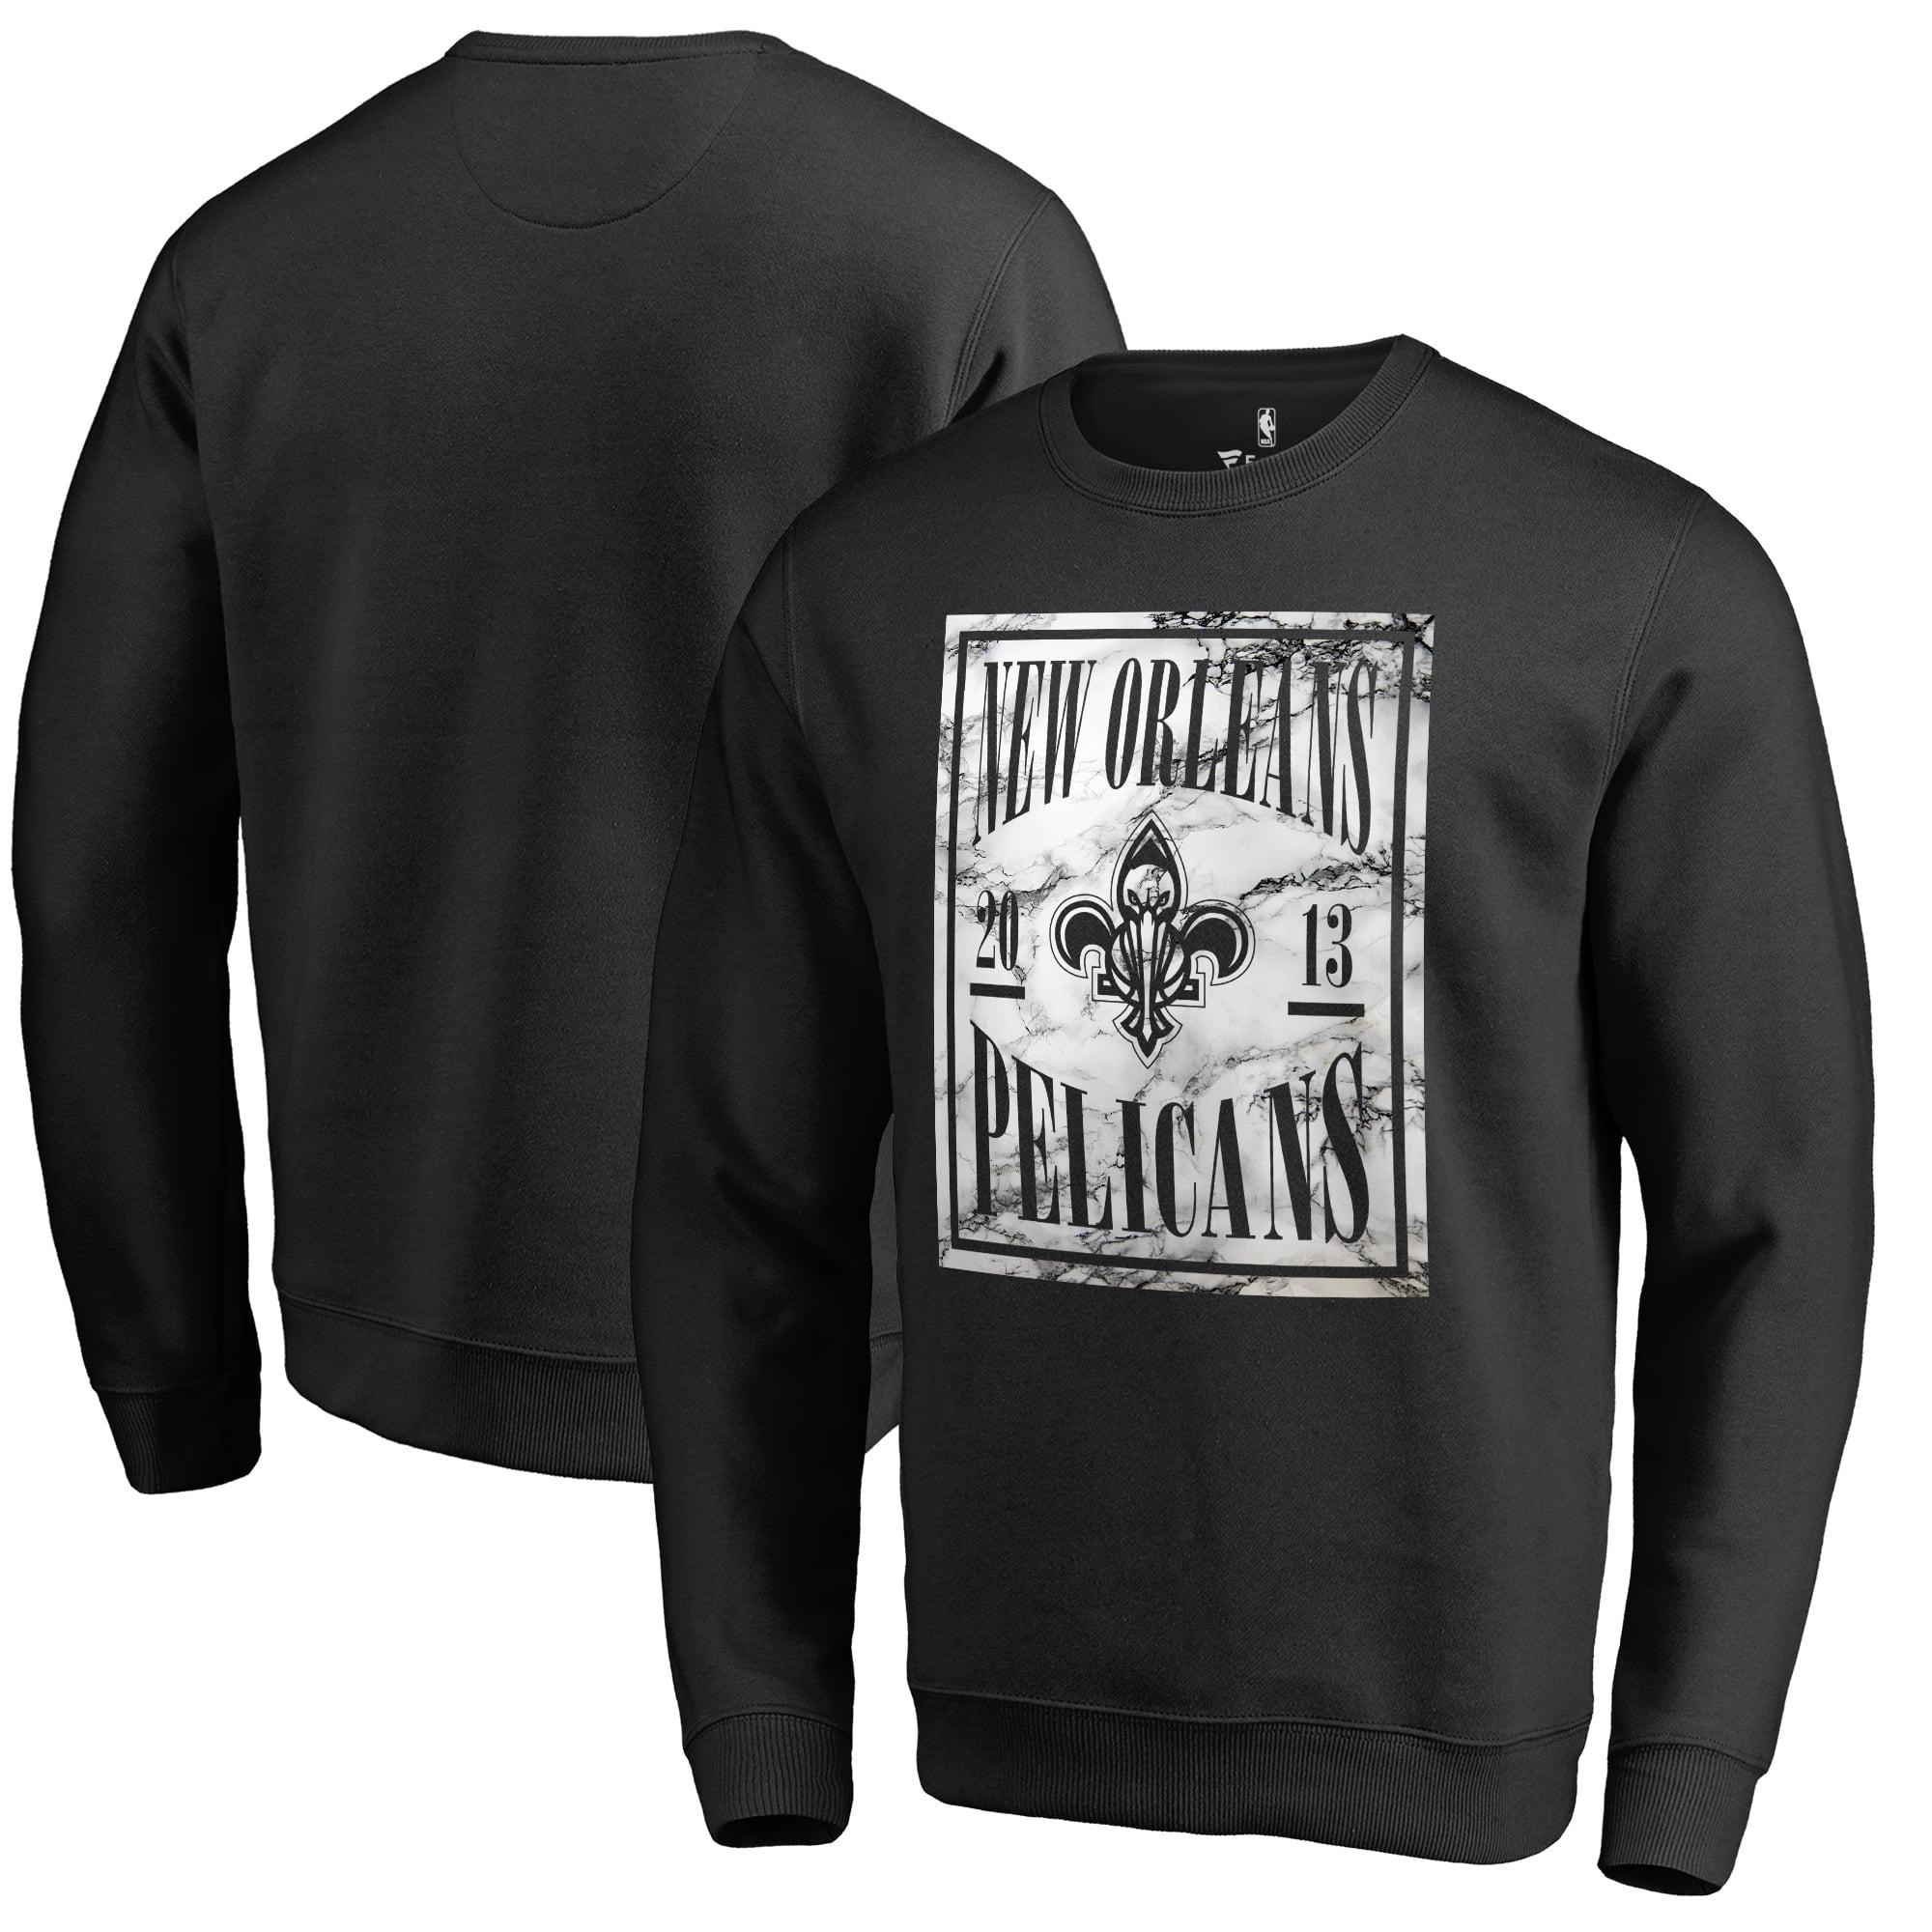 New Orleans Pelicans Fanatics Branded Court Vision Crew Sweatshirt - Black